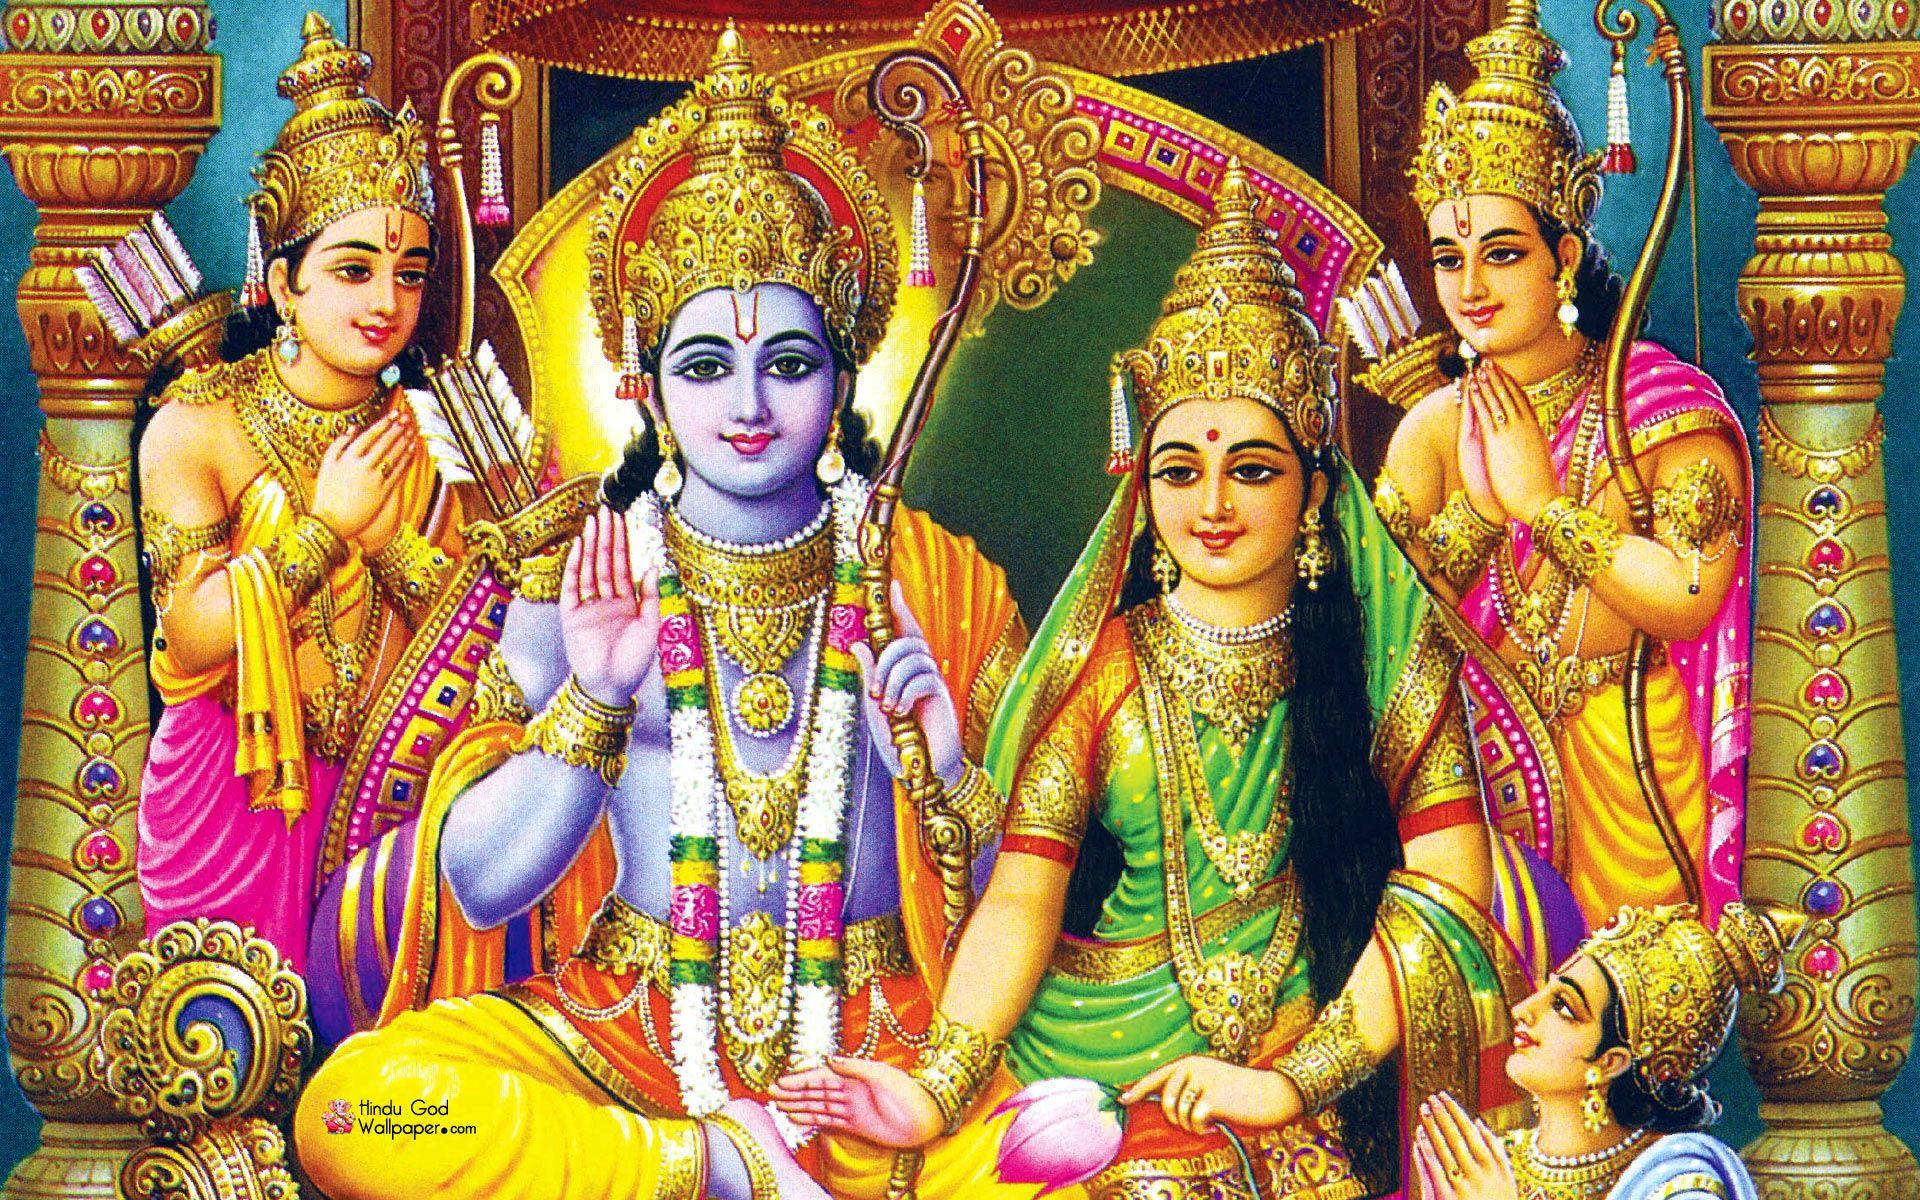 PunjabKesari, श्री रामचरित मानस, रामायण, श्री राम, Sri Ram Charit manas, Ramayana